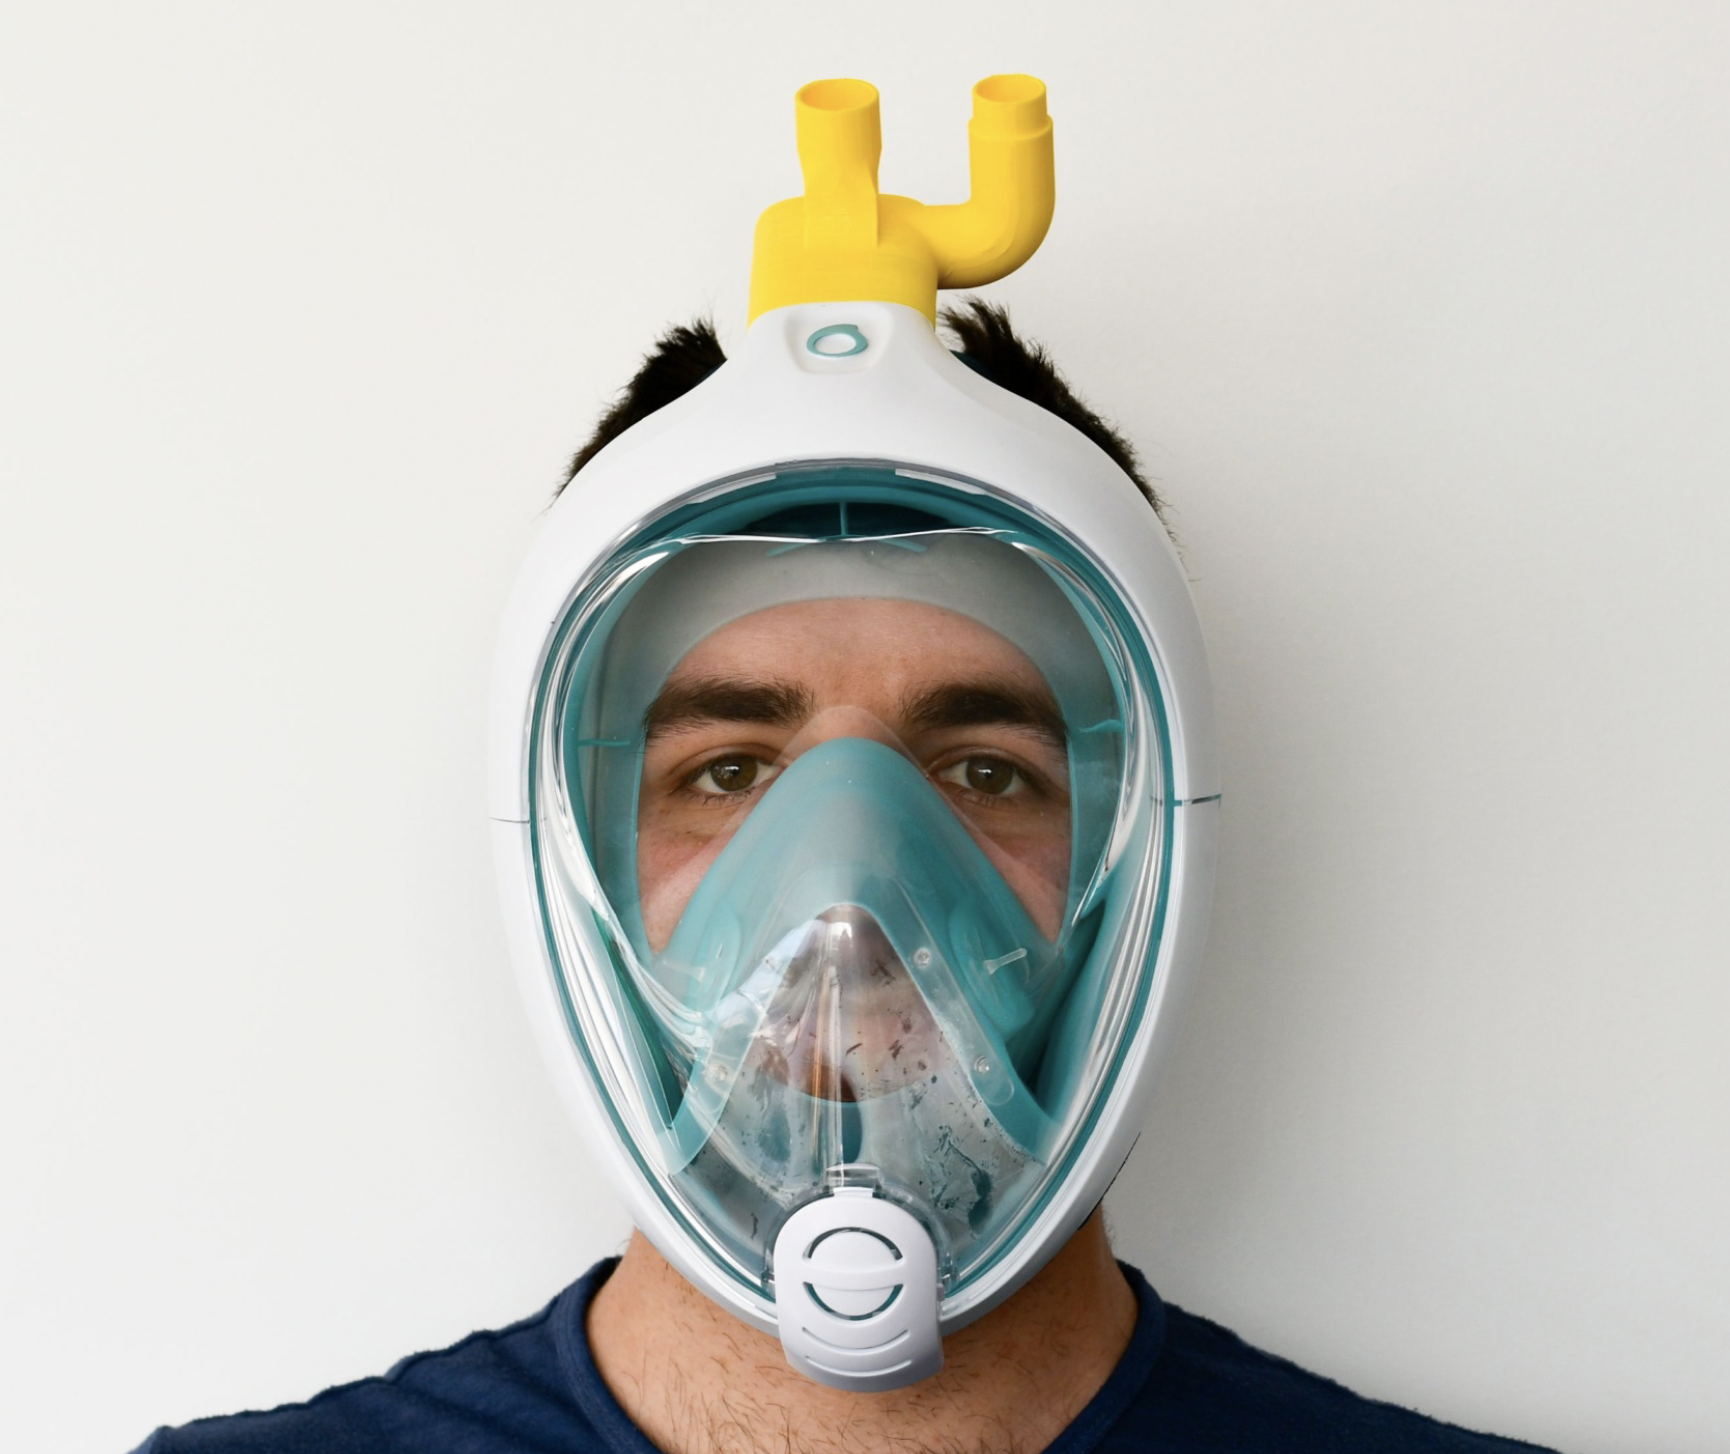 DSC3147-scaled.png Download free STL file EASY COVID 19 - Emergency mask for hospital ventilators • 3D printing design, isinnova